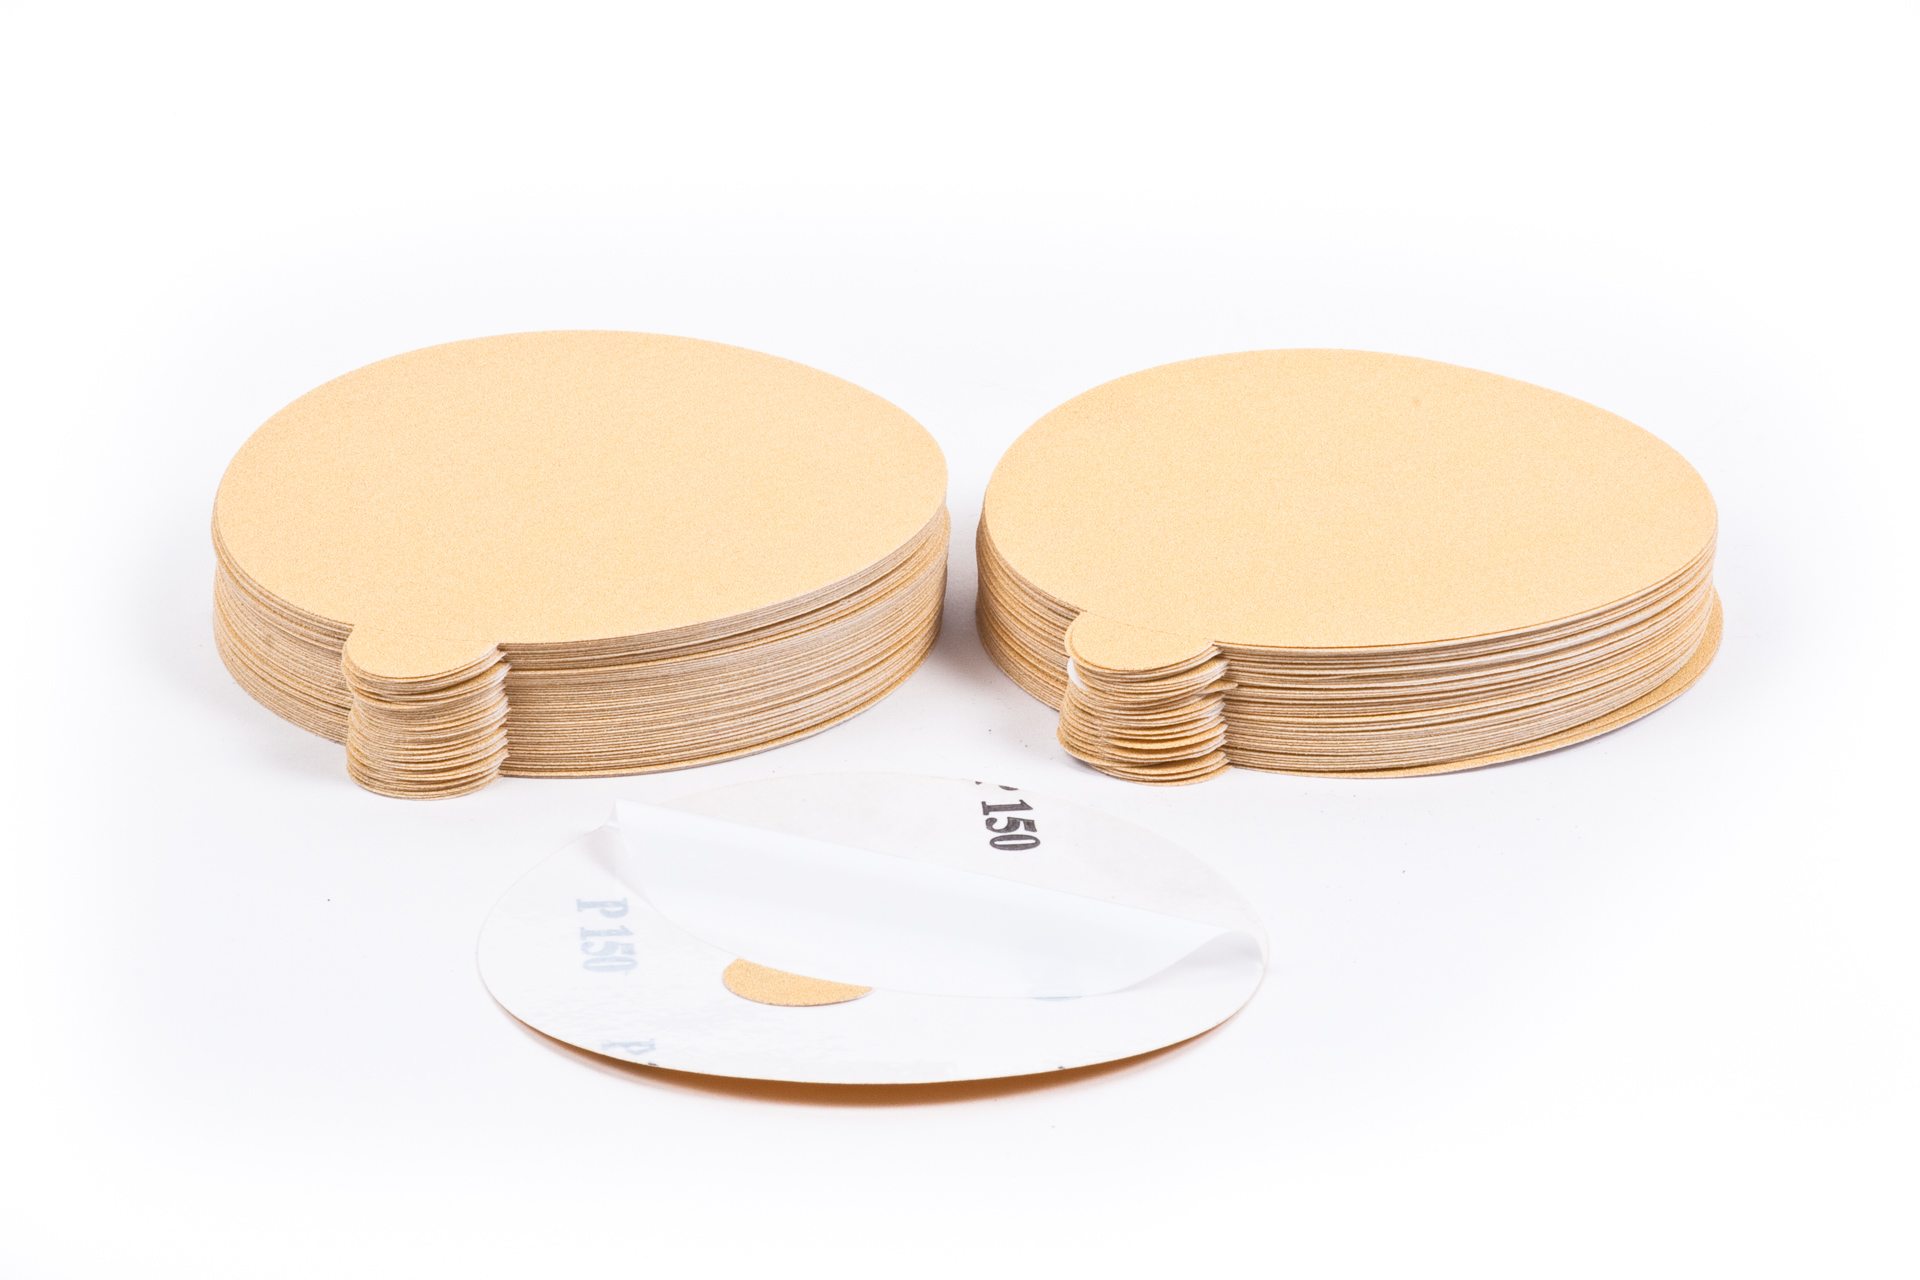 paper psa and velcro sanding discs